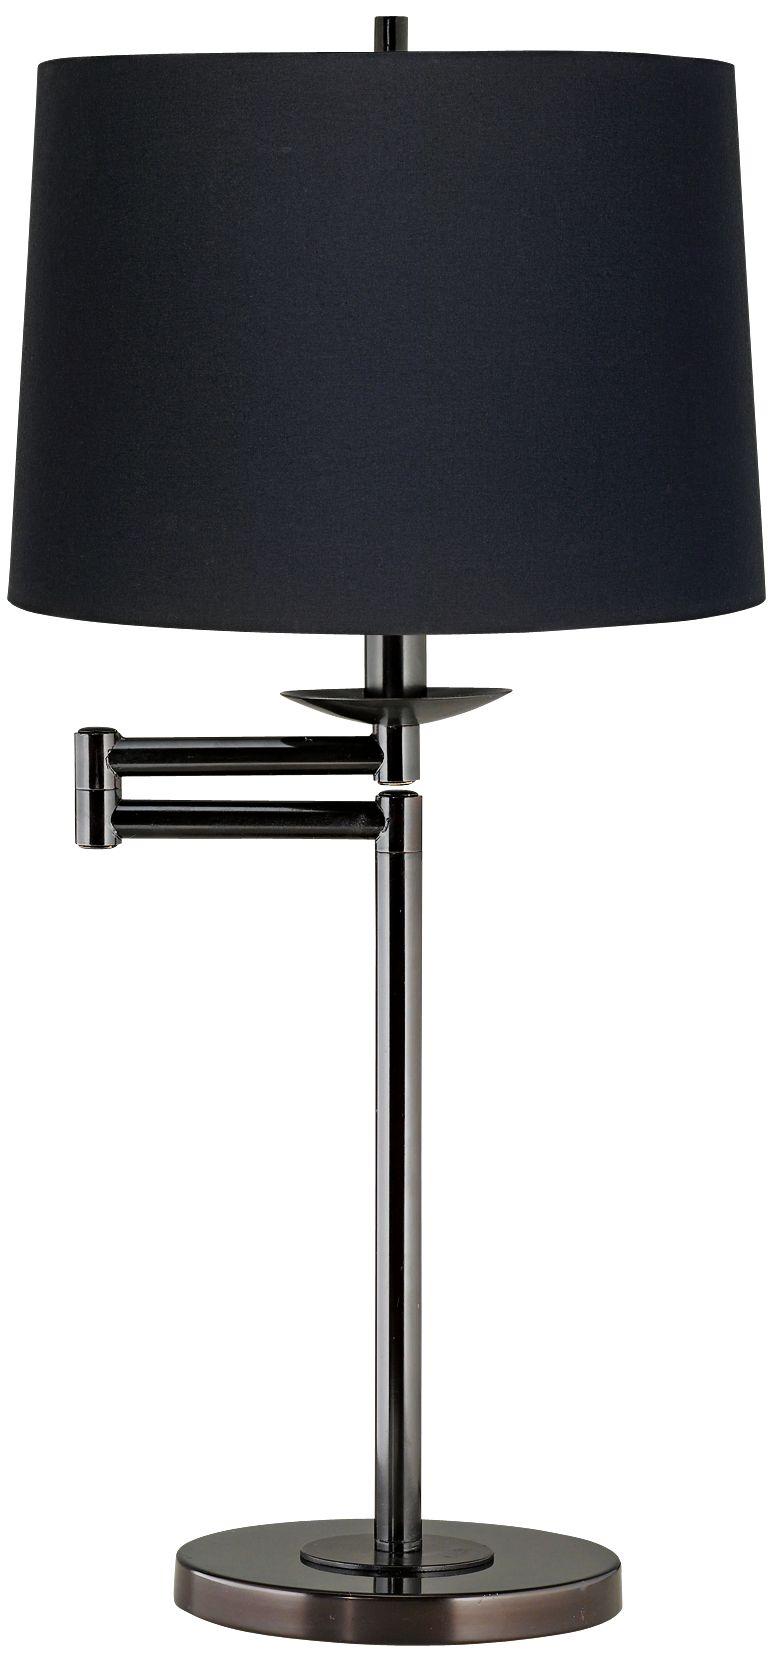 Exceptional Black Fabric Drum Shade Bronze Swing Arm Desk Lamp